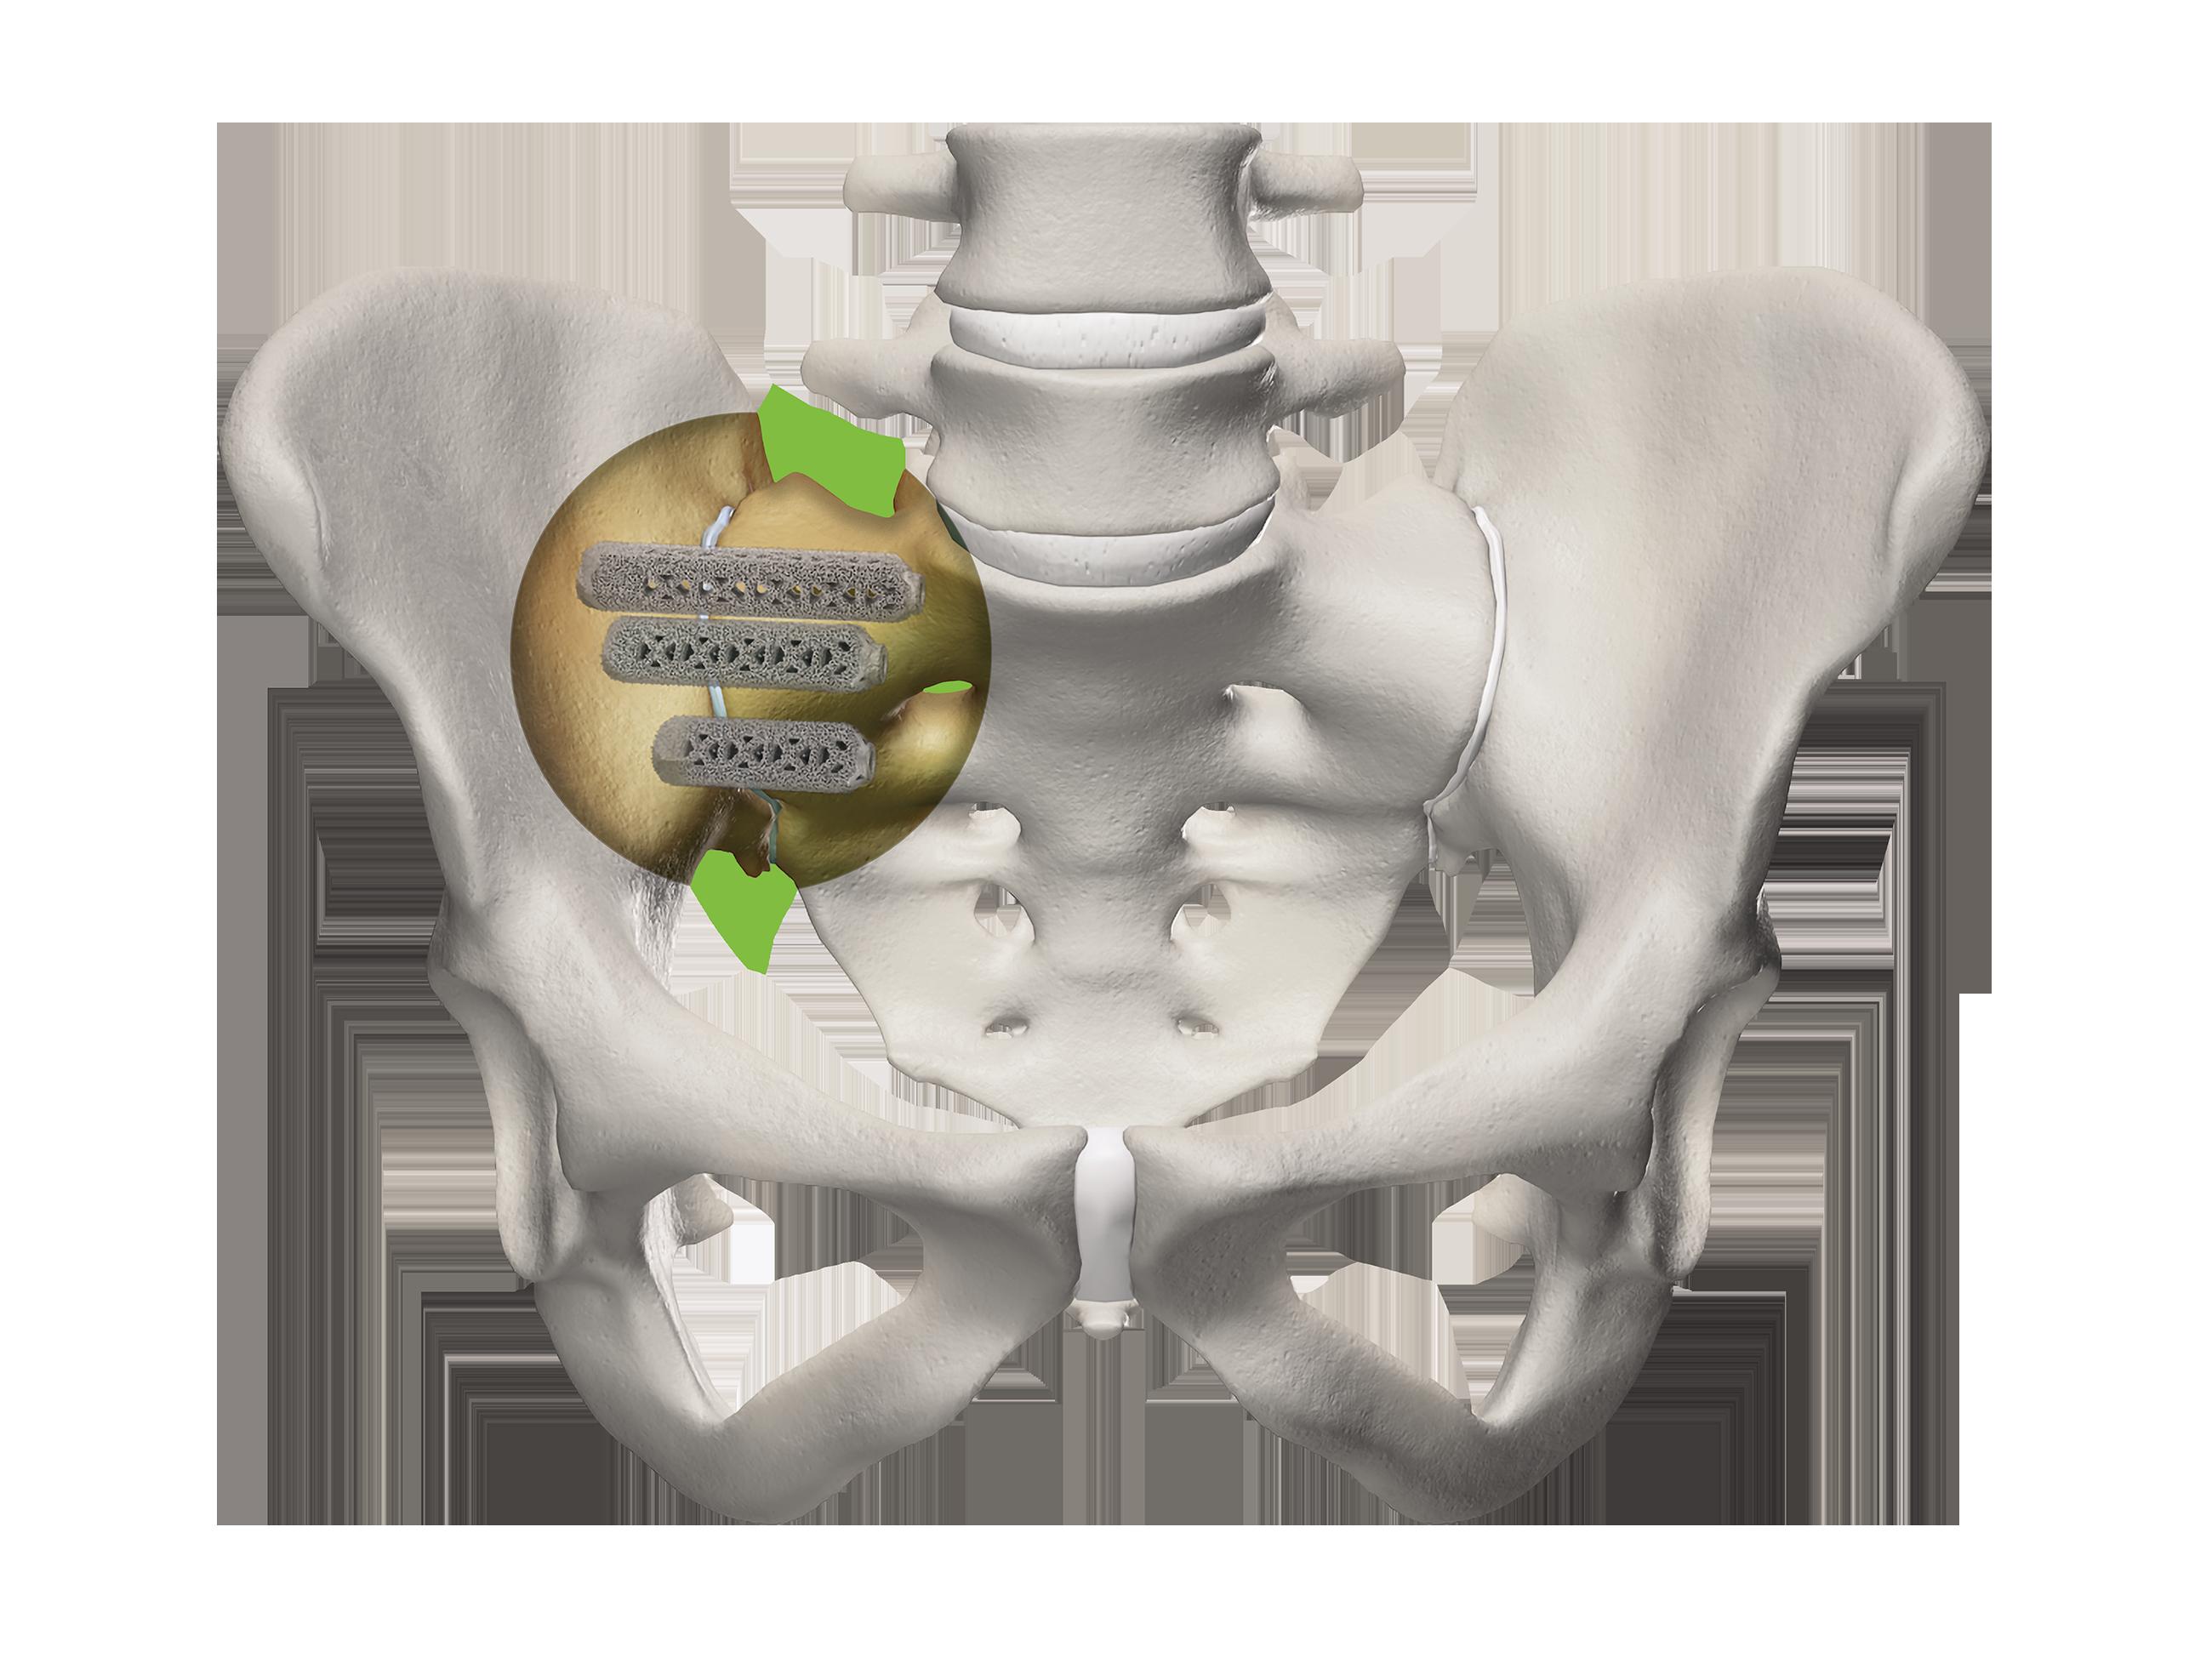 Pelvis closeup with 3D Implants